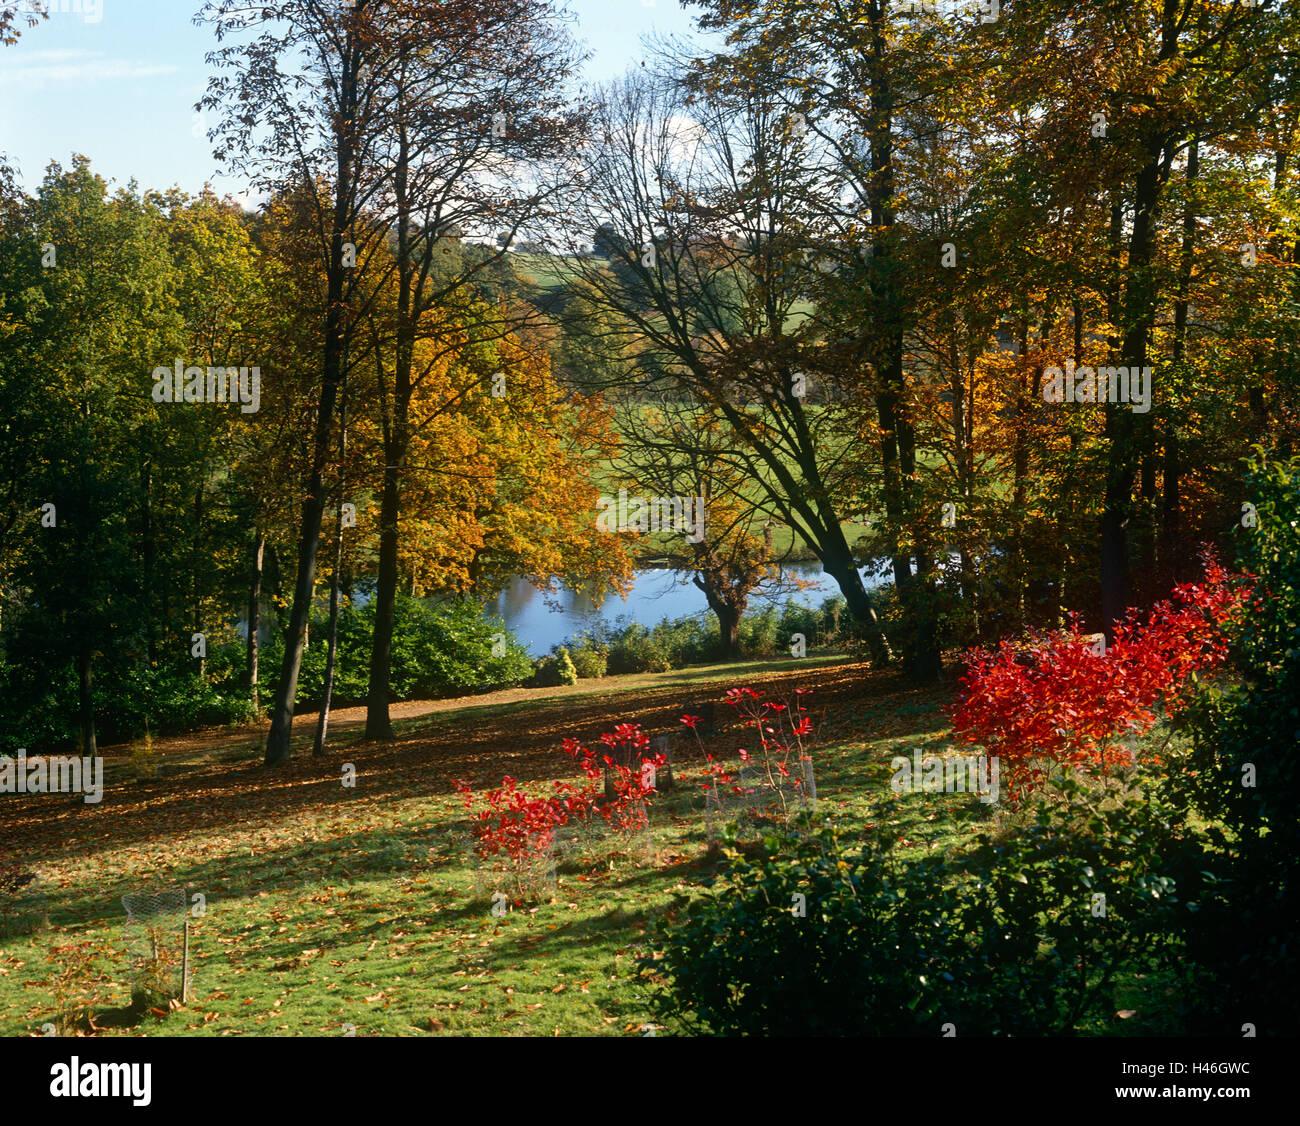 Winkworth Arboretum Godalming, Surrey - Stock Image